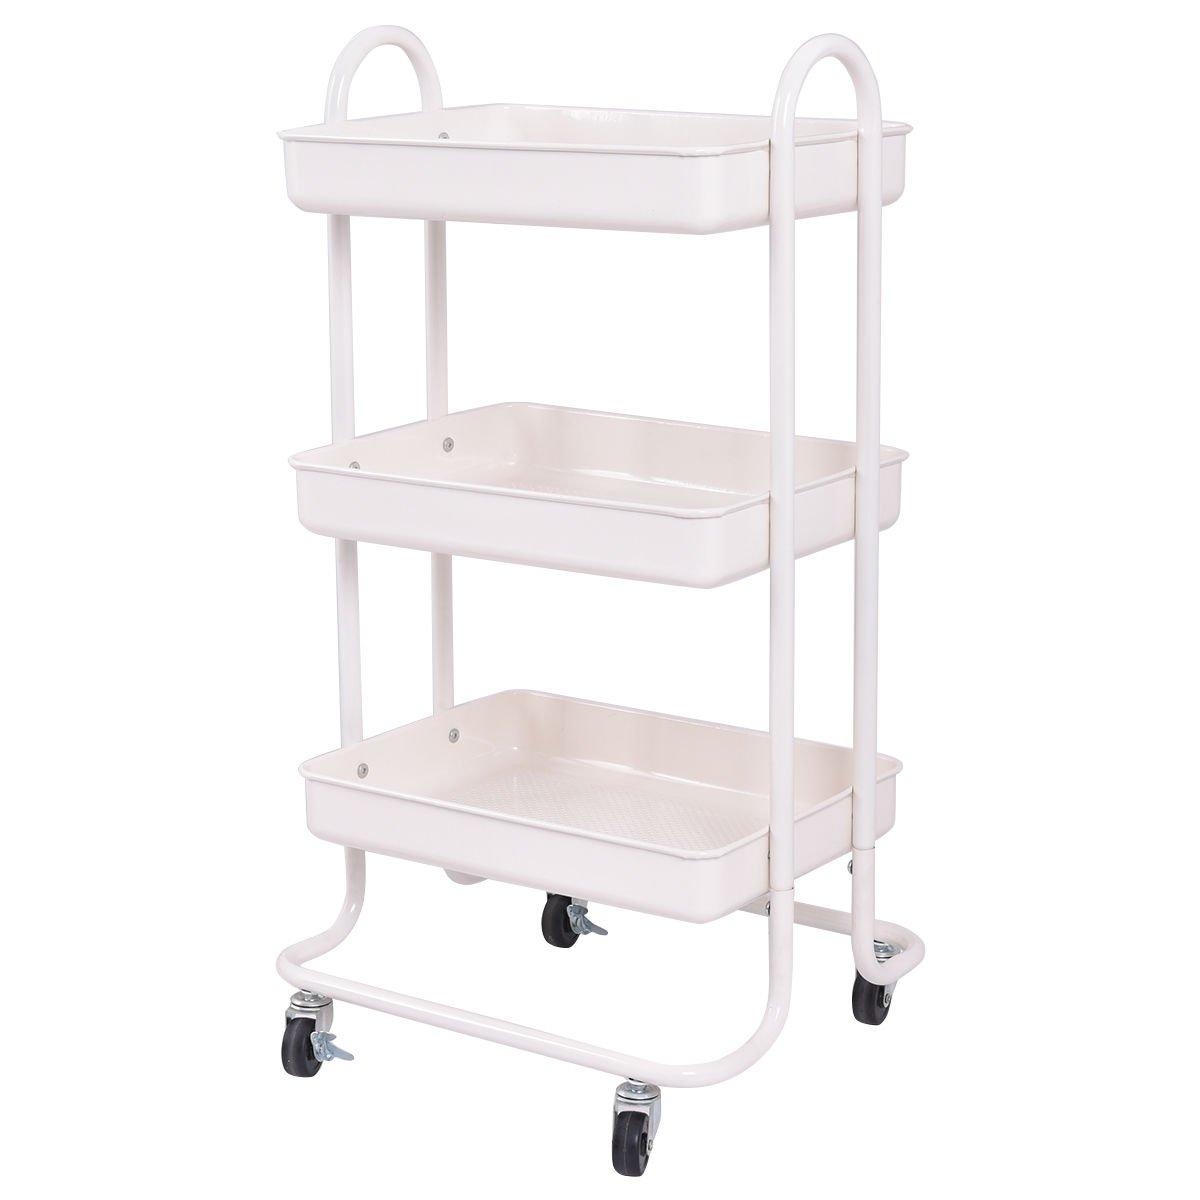 Giantex 3-Tier Rolling Kitchen Trolley Cart Portable Shelves Handle ...